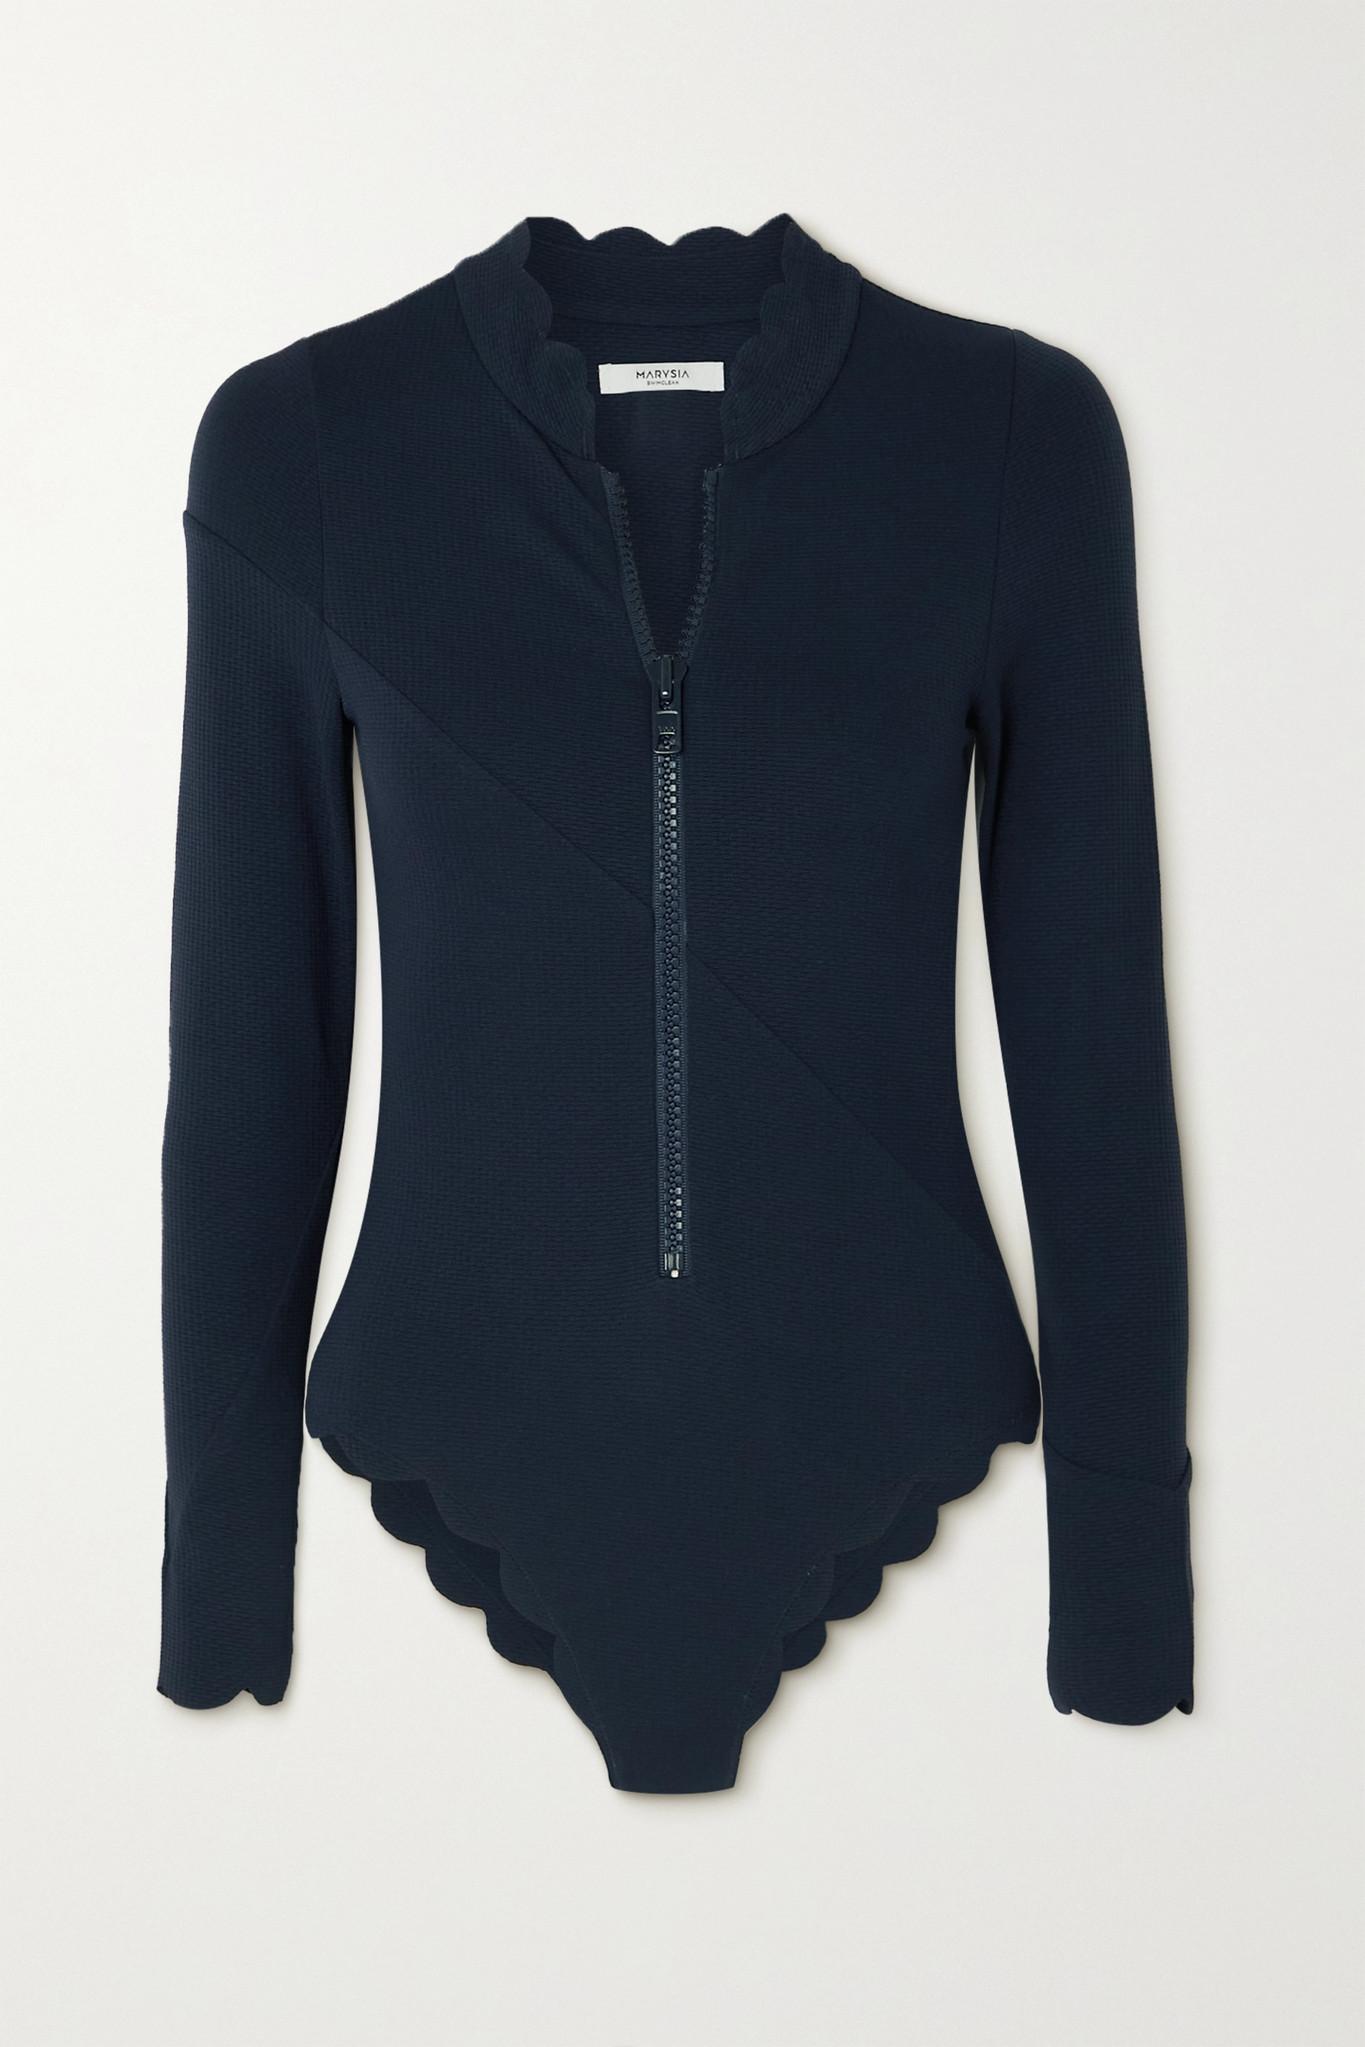 MARYSIA - + Net Sustain North Sea Scalloped Recycled Seersucker Swimsuit - Blue - x small